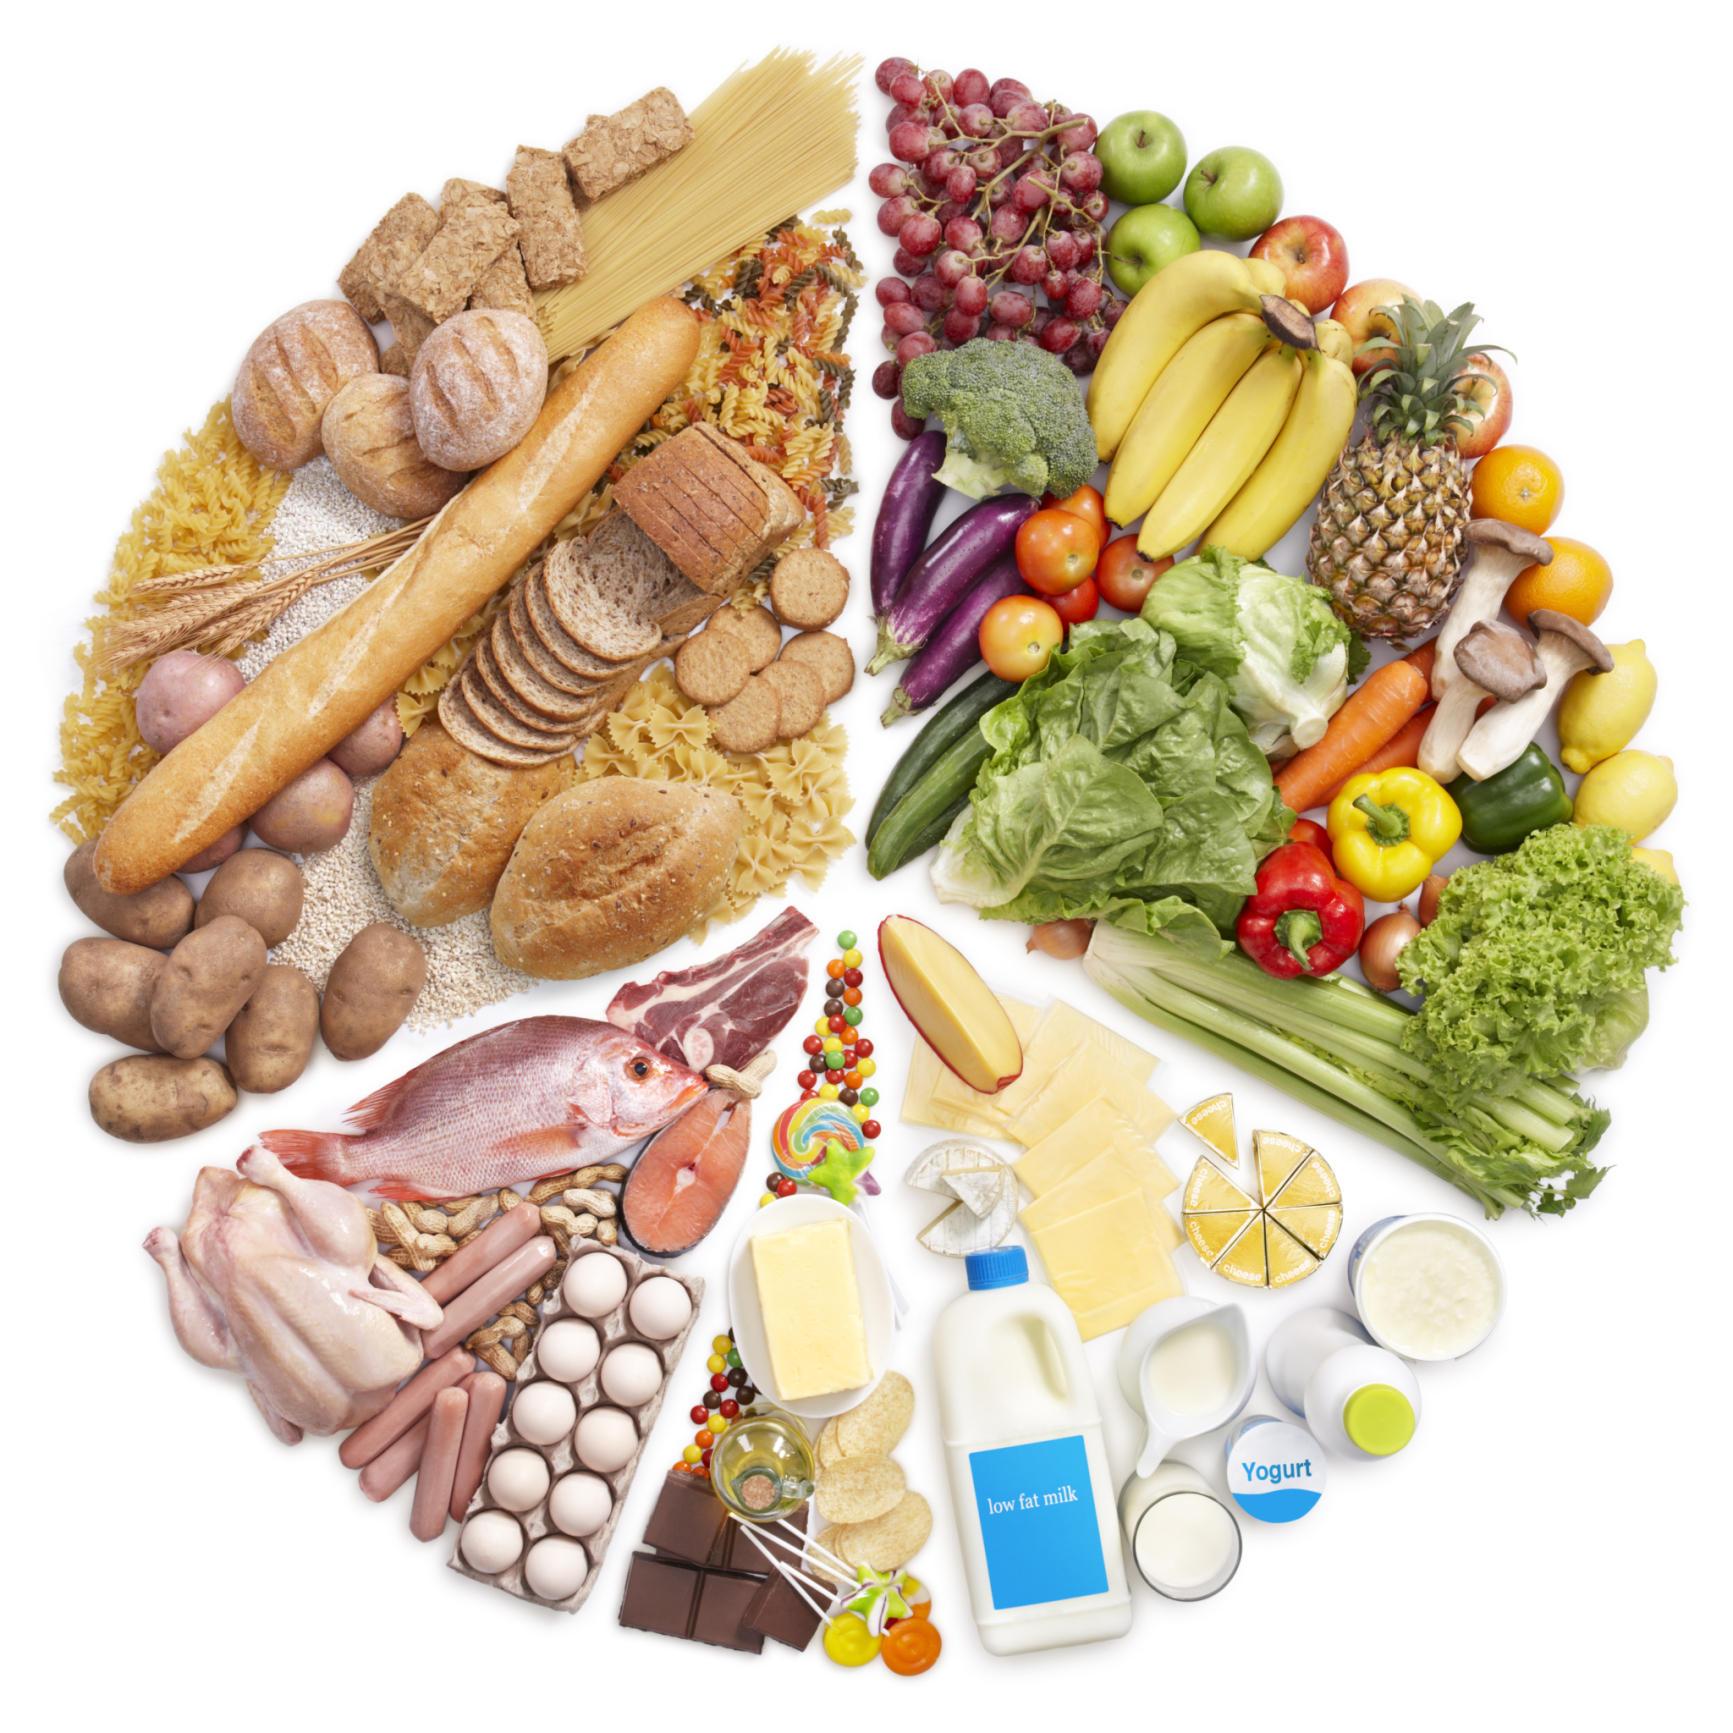 5 Benefits of Proper Nutrition